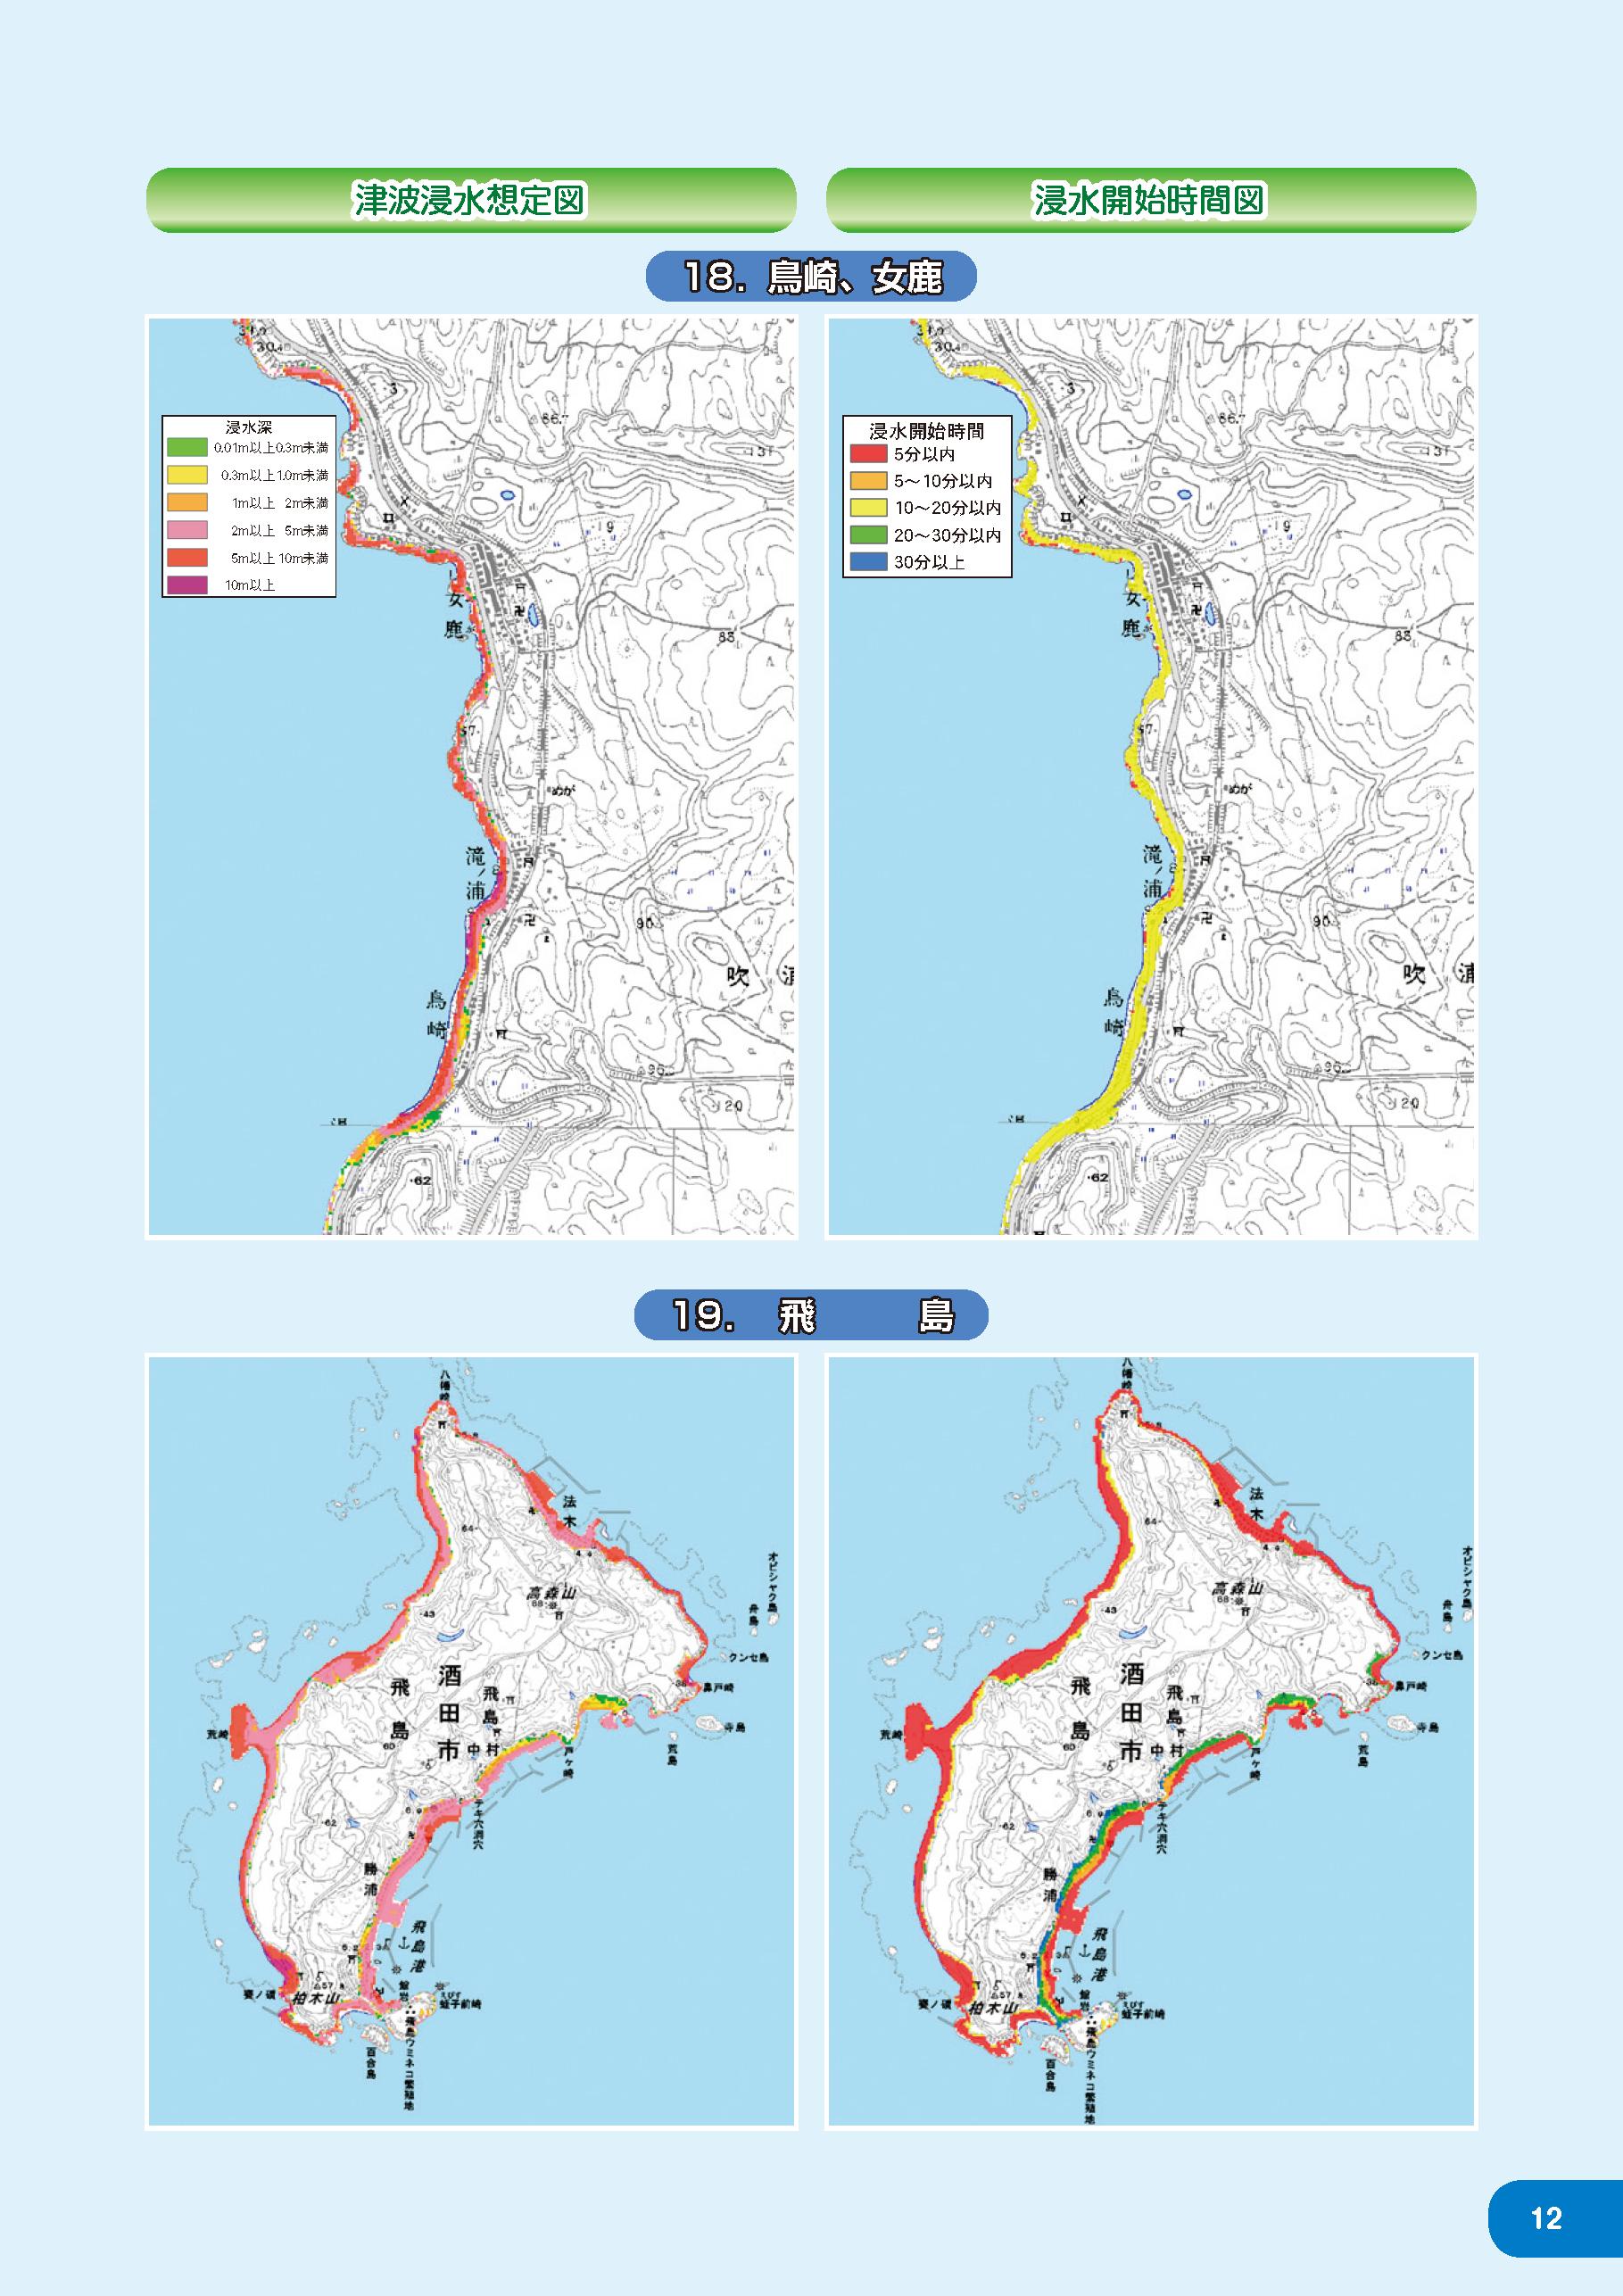 鳥崎・女鹿・飛島の浸水想定と浸水開始時